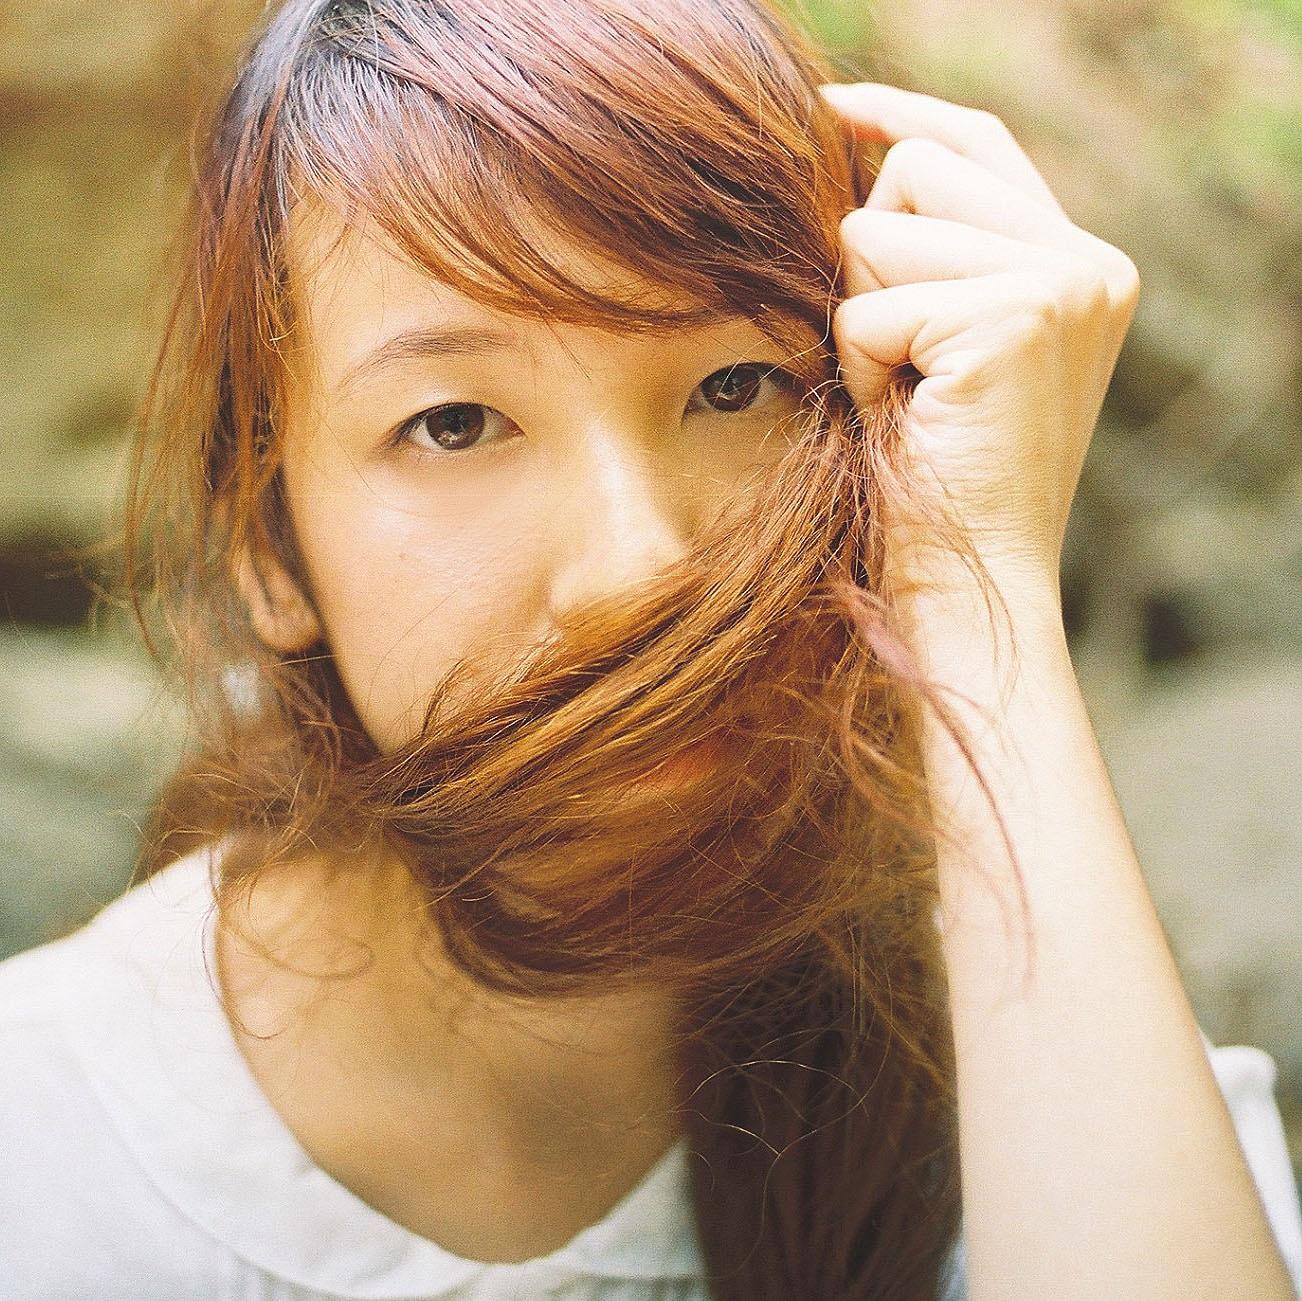 Go to Waranya Mooldee's profile